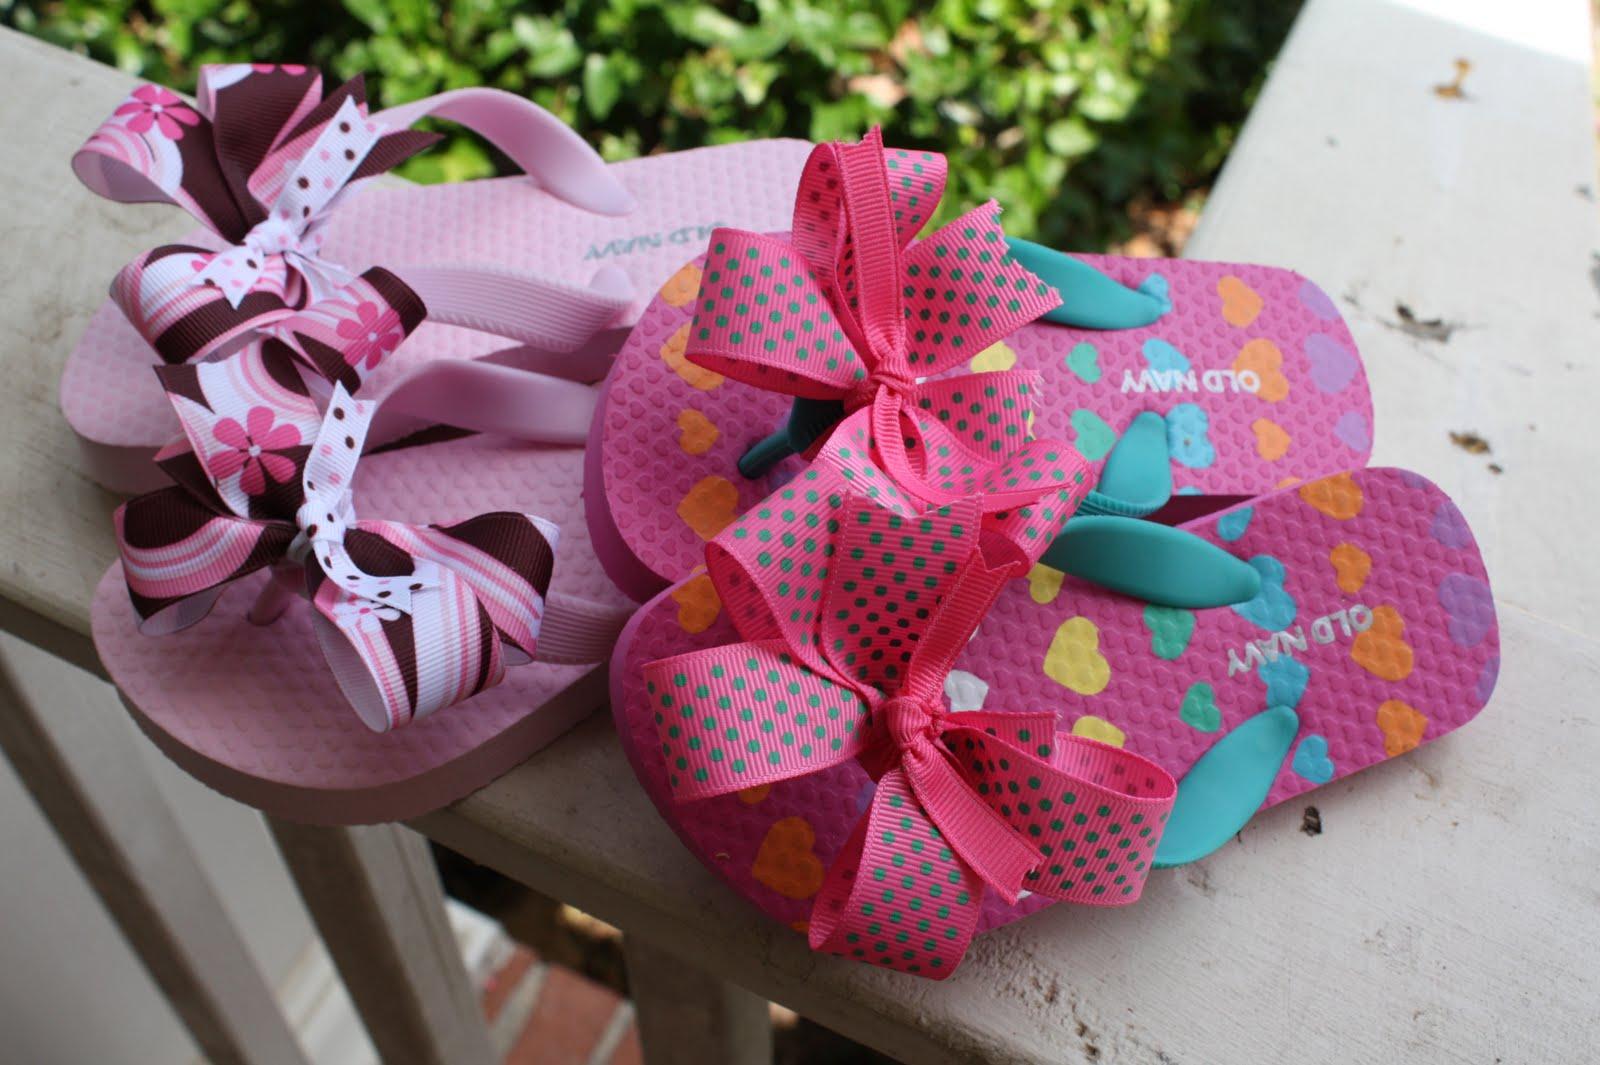 95c78a8c10da3 one pair plain flip flops 2 pieces 7 8 inch grossgrain ribbon cut to 20  inches 2 pieces 3 8 inch grossgrain ribbon in coordinating colors cut to 13  inches